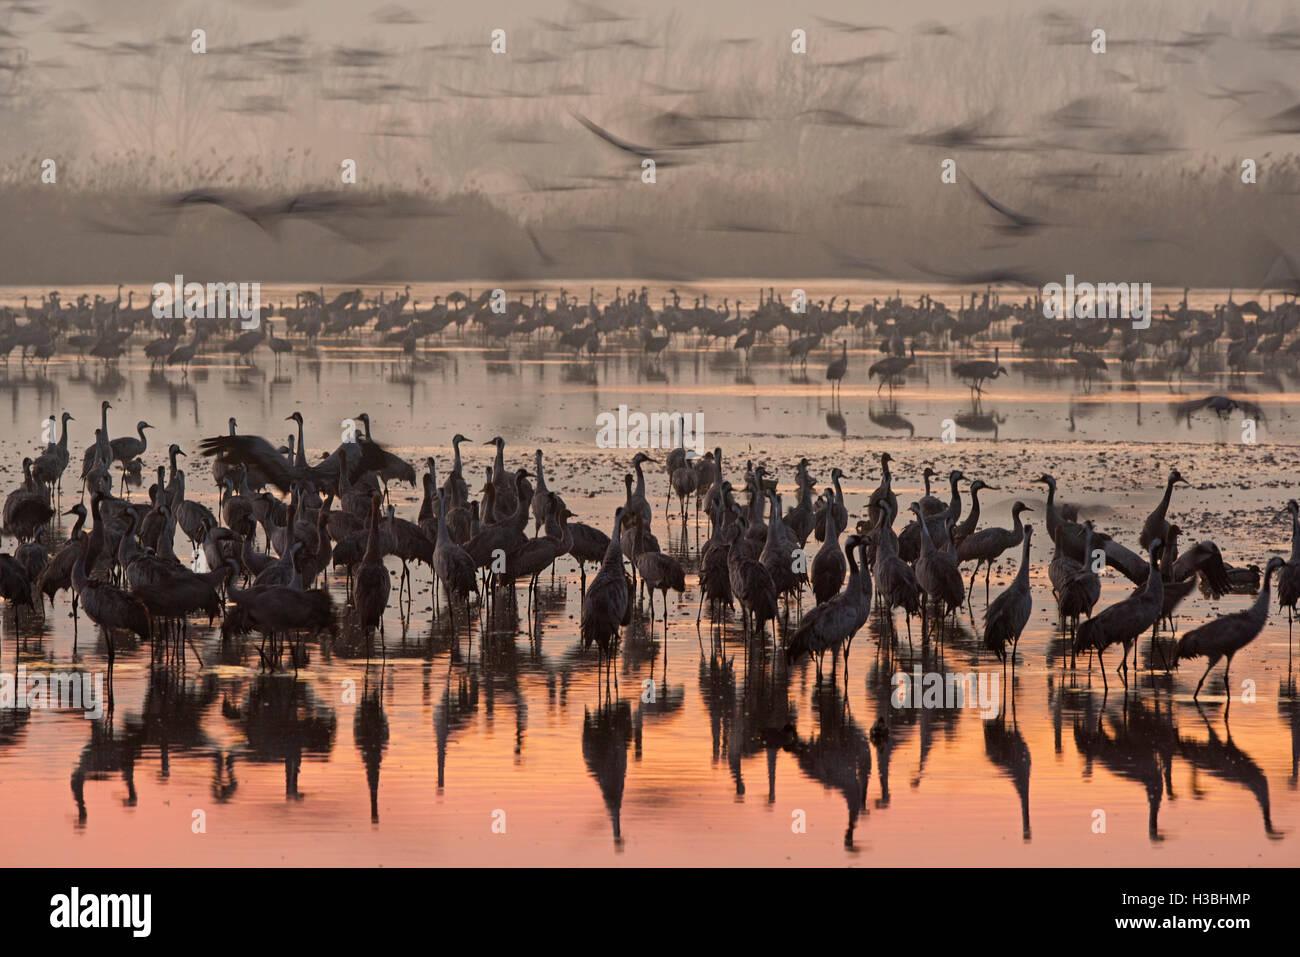 Common Cranes Grus grus, at dawn gradually leaving overnight roost on lake. Hula Israel Stock Photo